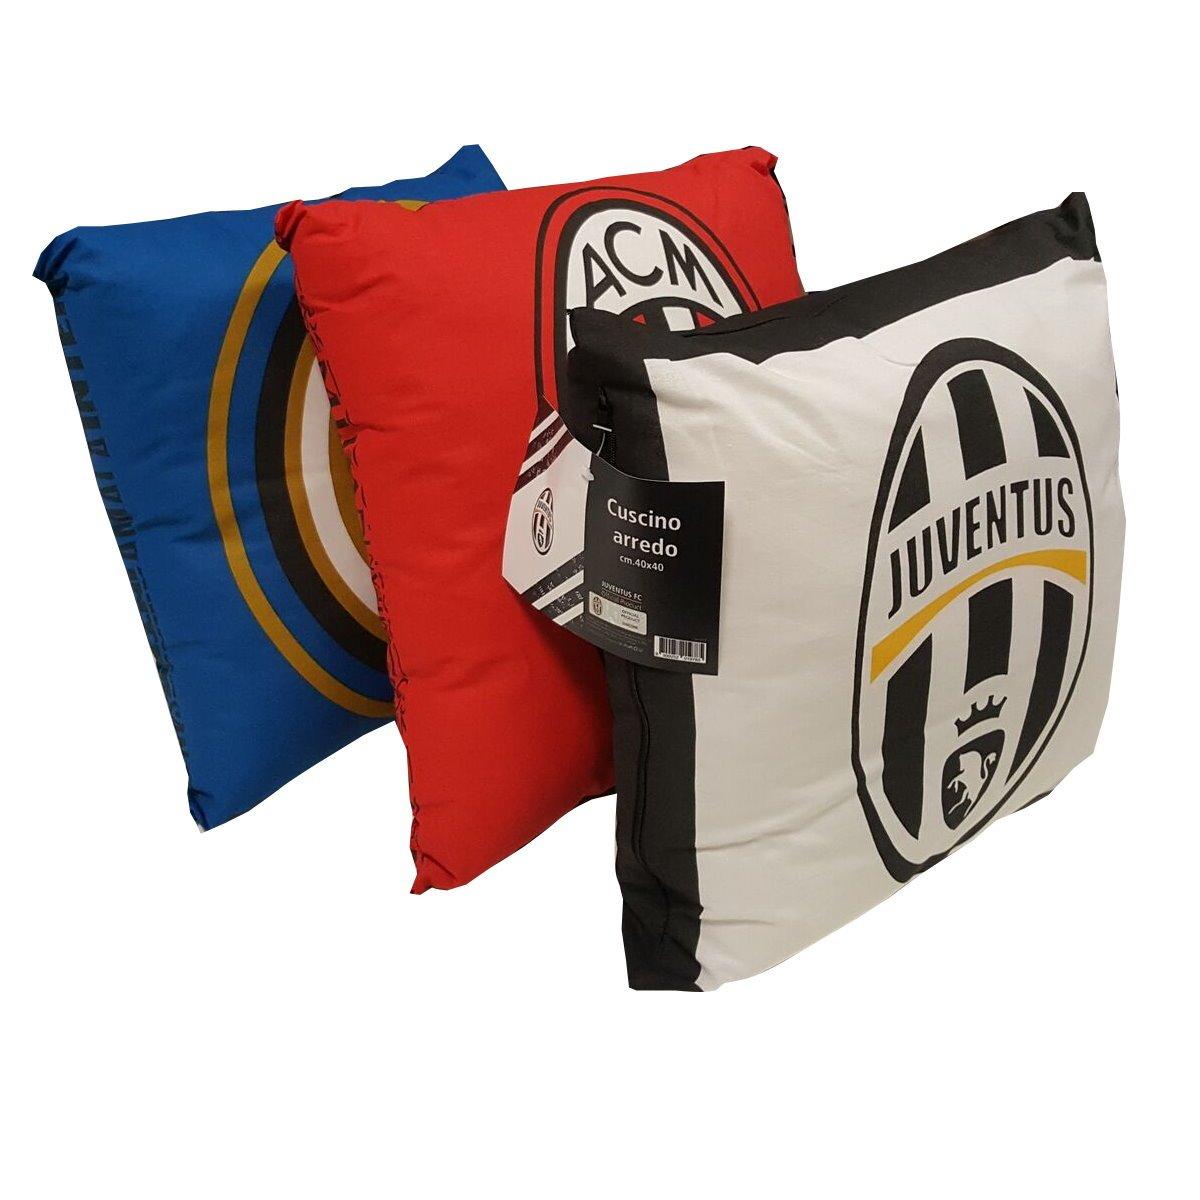 Vendita di cuscini di squadre di calcio luve milan inter for Vendita cuscini arredo